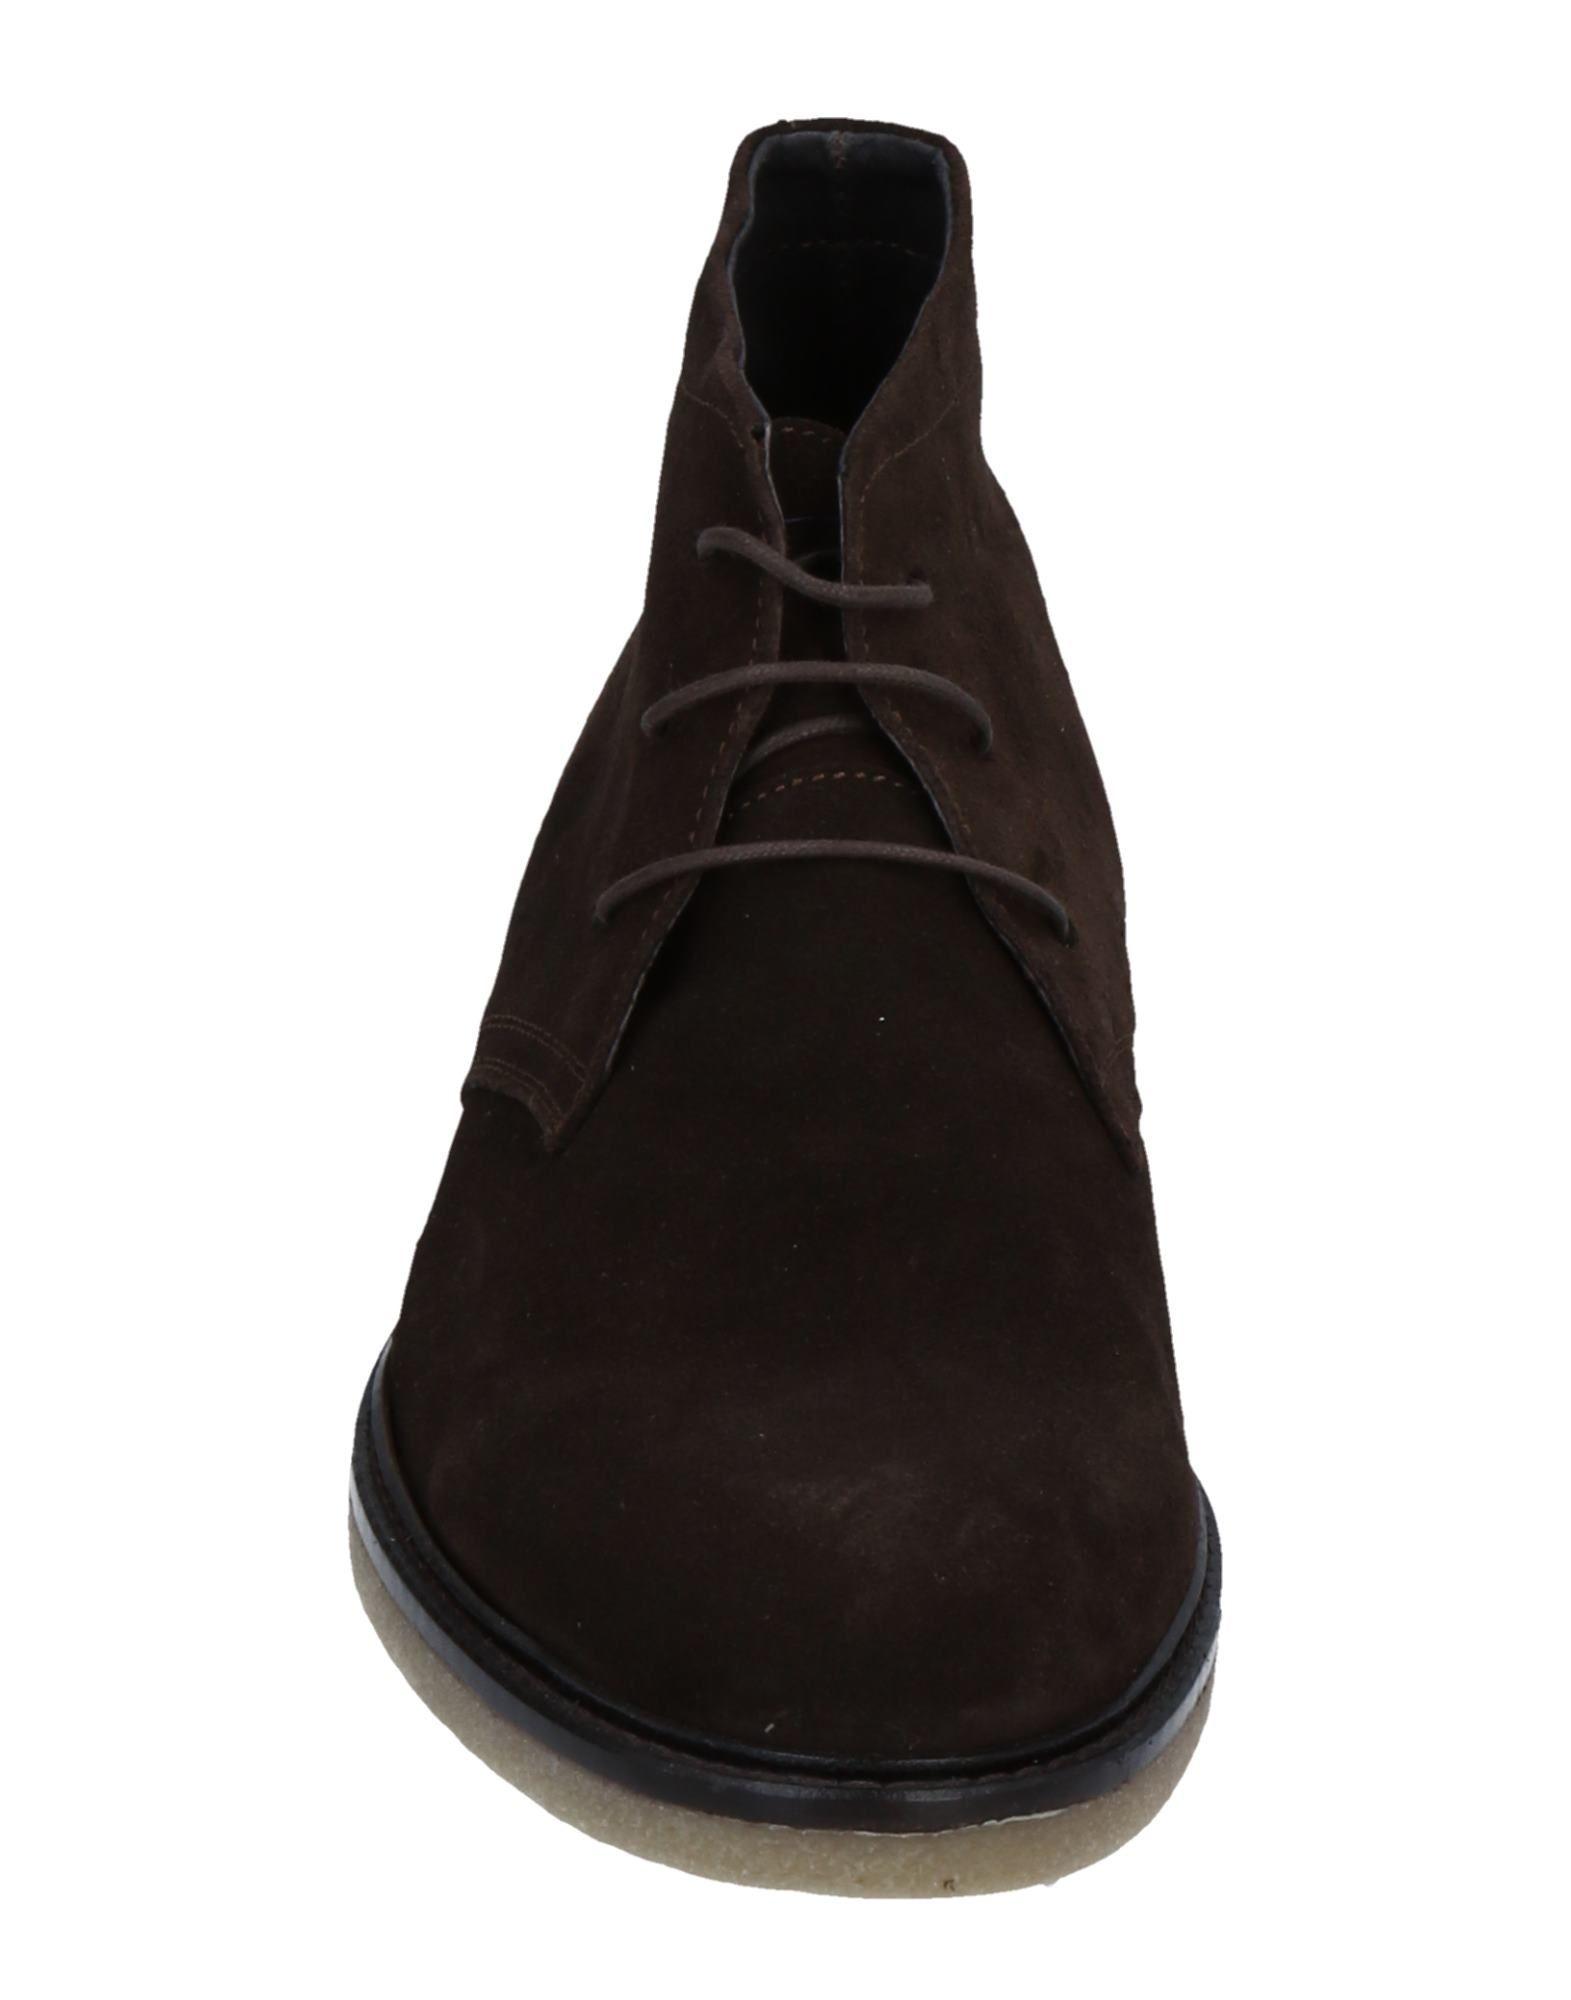 Rabatt echte Schuhe Schuhe echte Primo Emporio Stiefelette Herren 11516533KA 00c36c